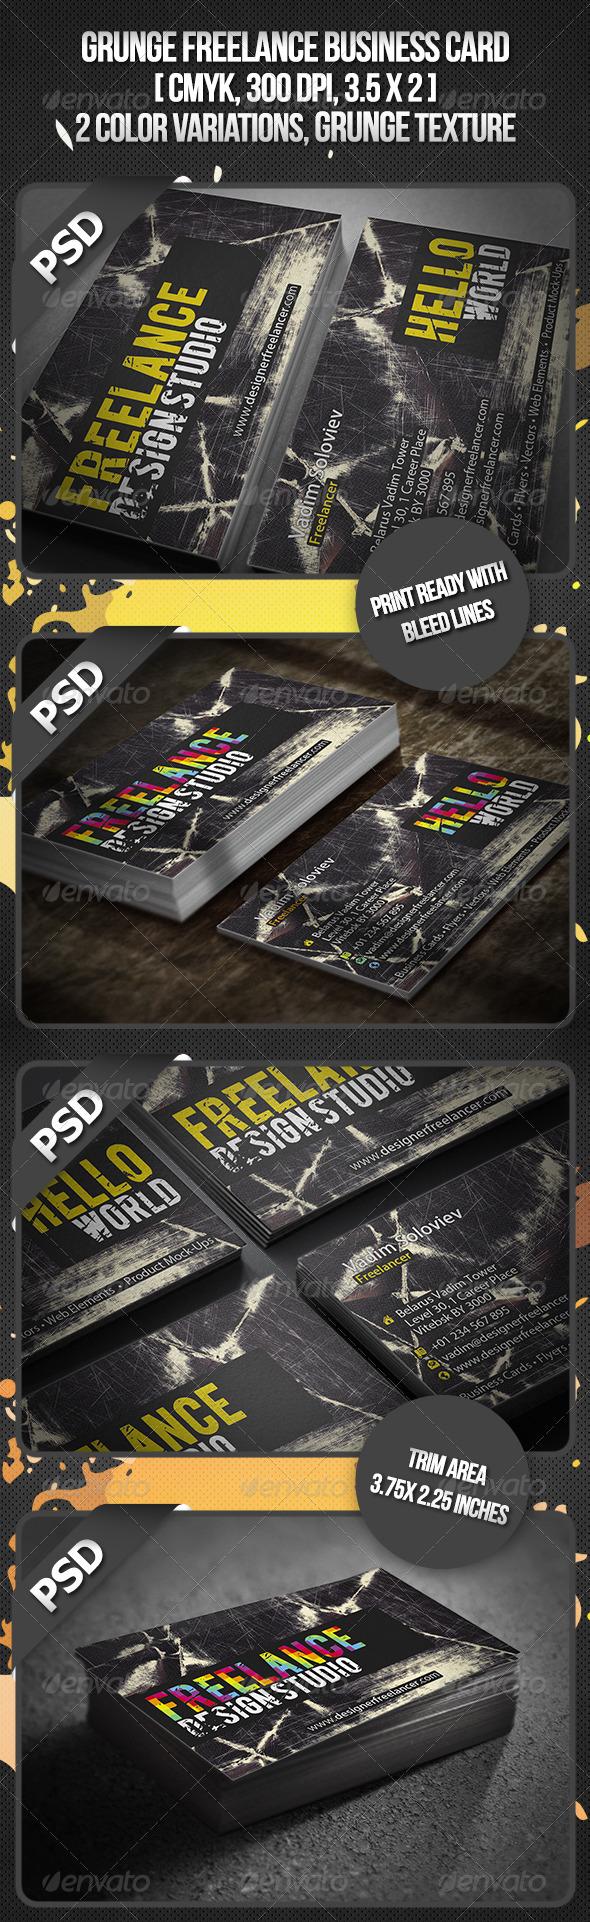 Grunge Freelance Business Card - Grunge Business Cards